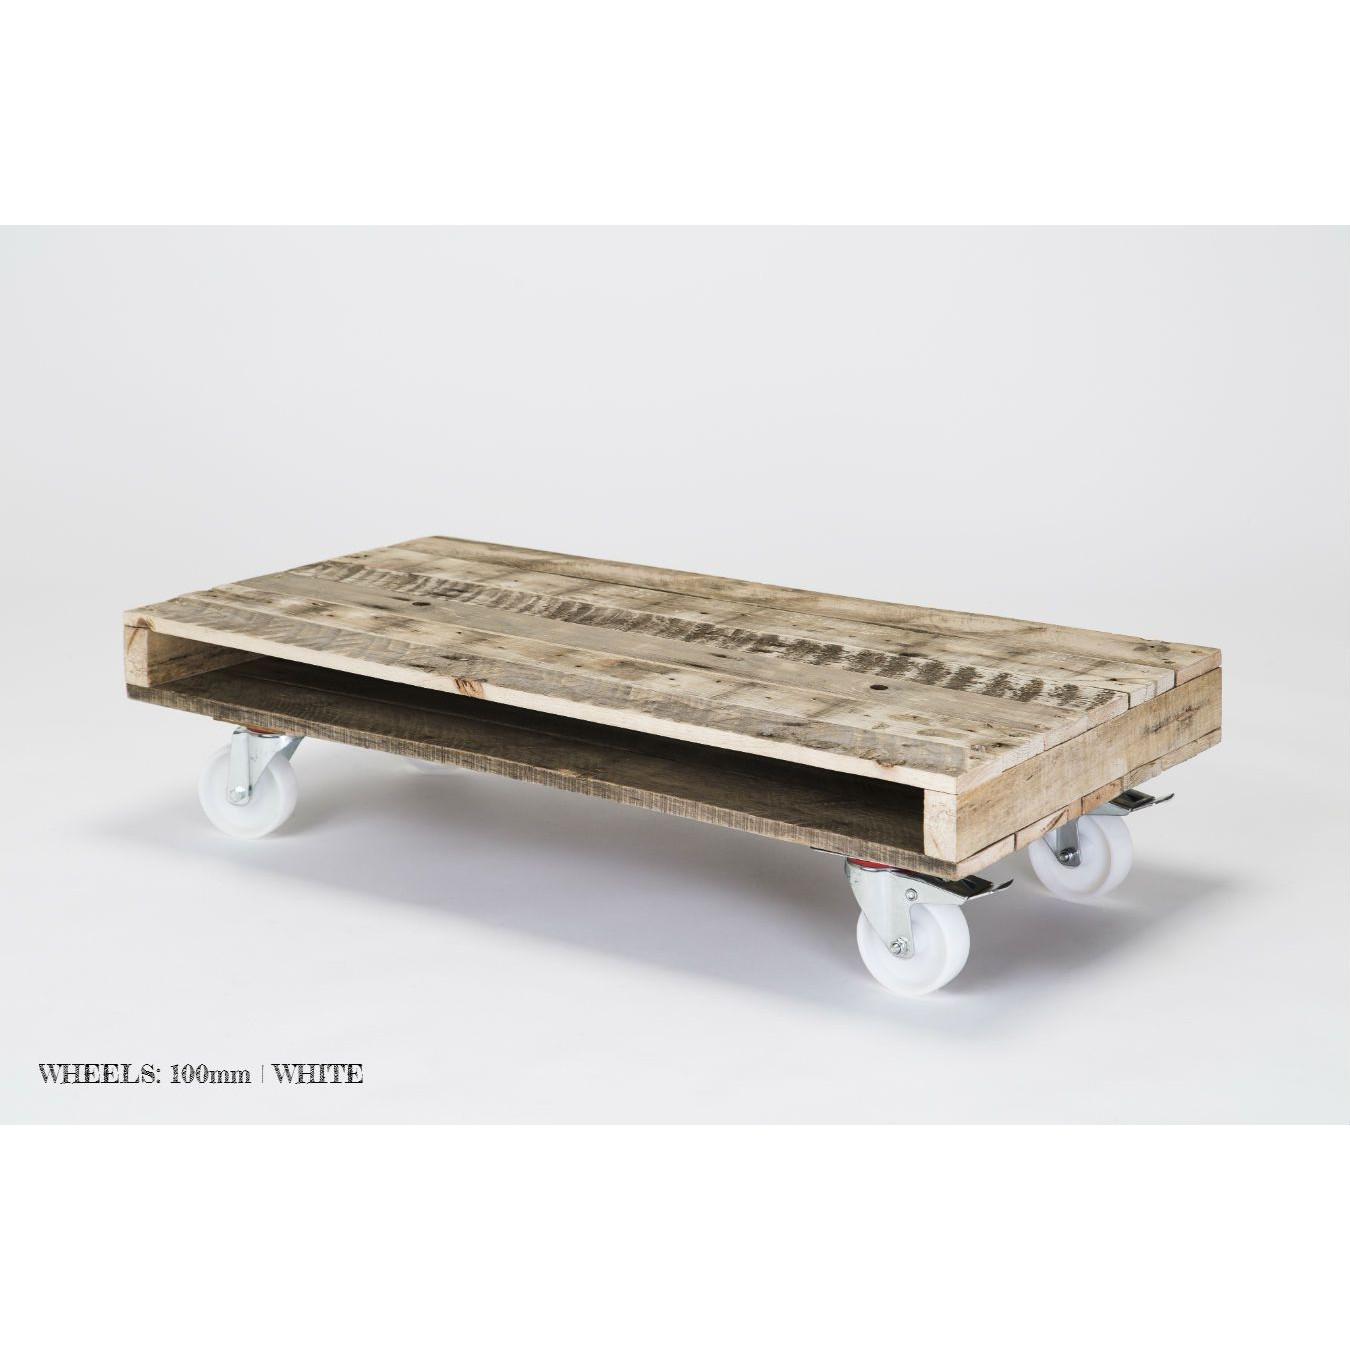 'On Wheels' Coffee Table